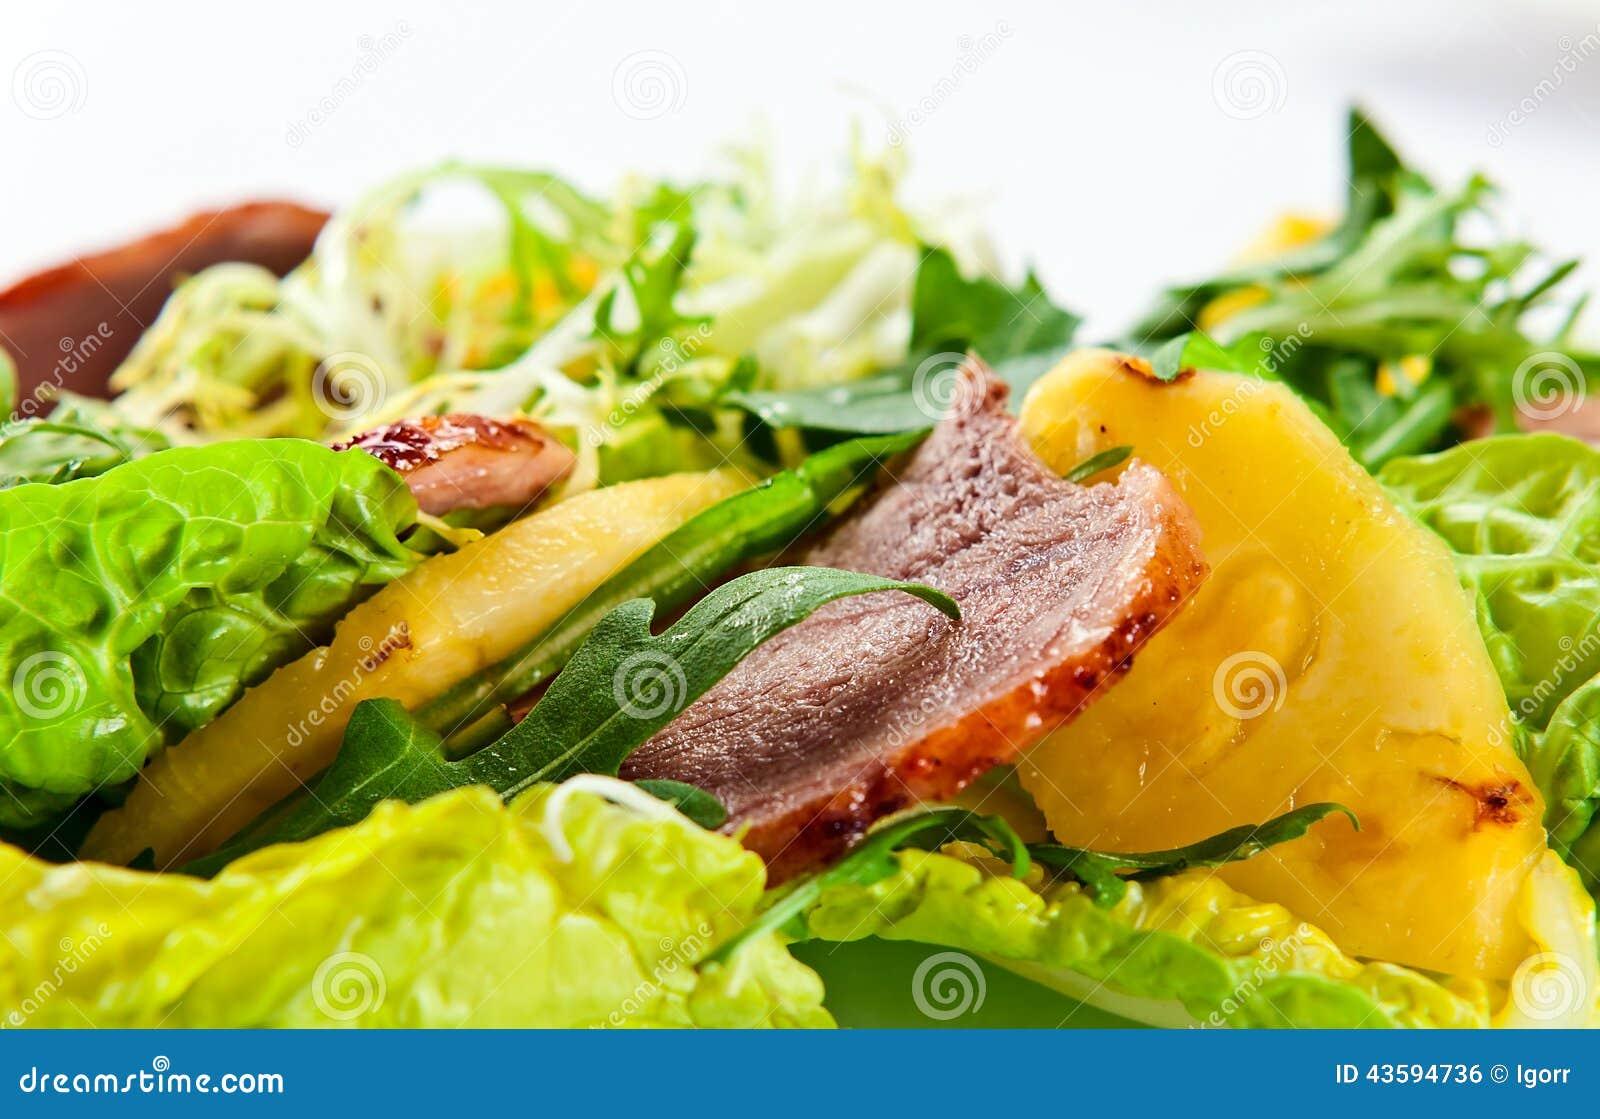 salade avec l 39 ananas et la viande fum e photo stock image 43594736. Black Bedroom Furniture Sets. Home Design Ideas